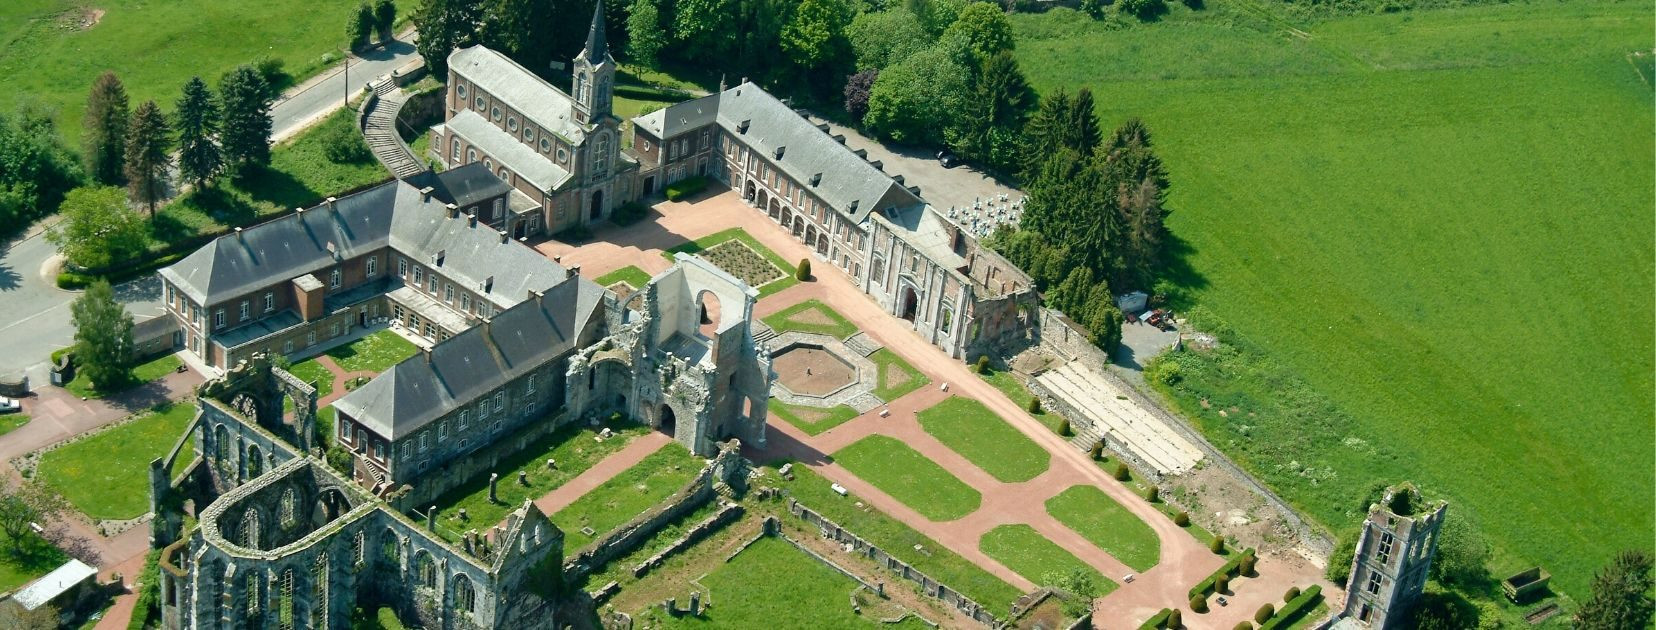 abbaye d'aulne2.jpg